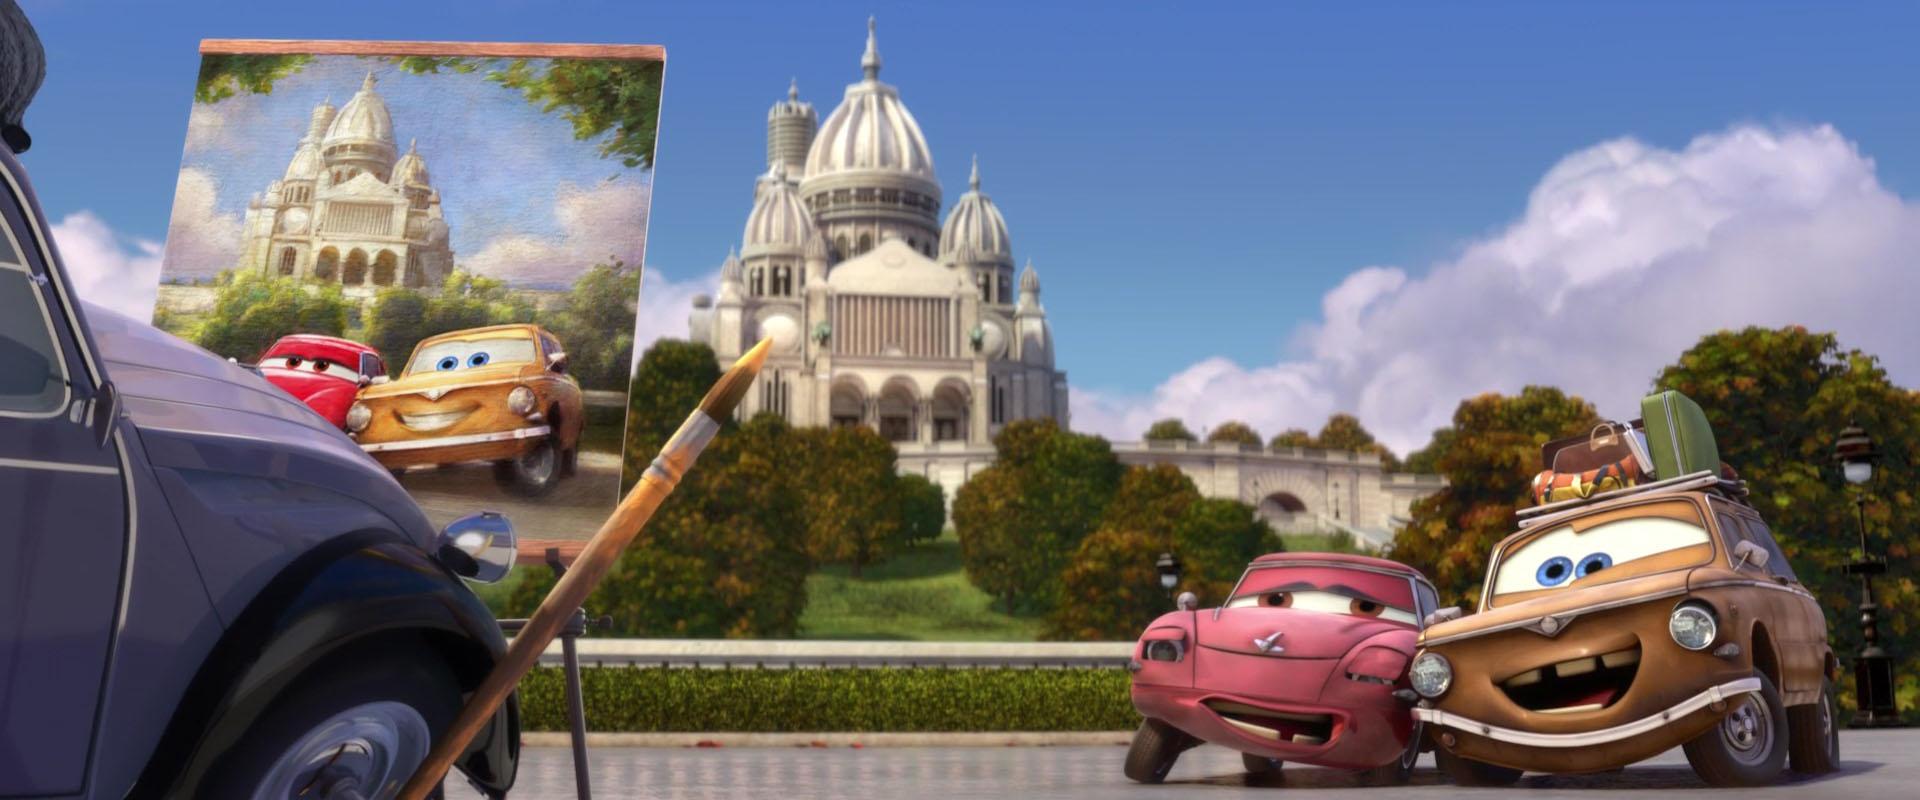 lubewig personnage character pixar disney cars 2